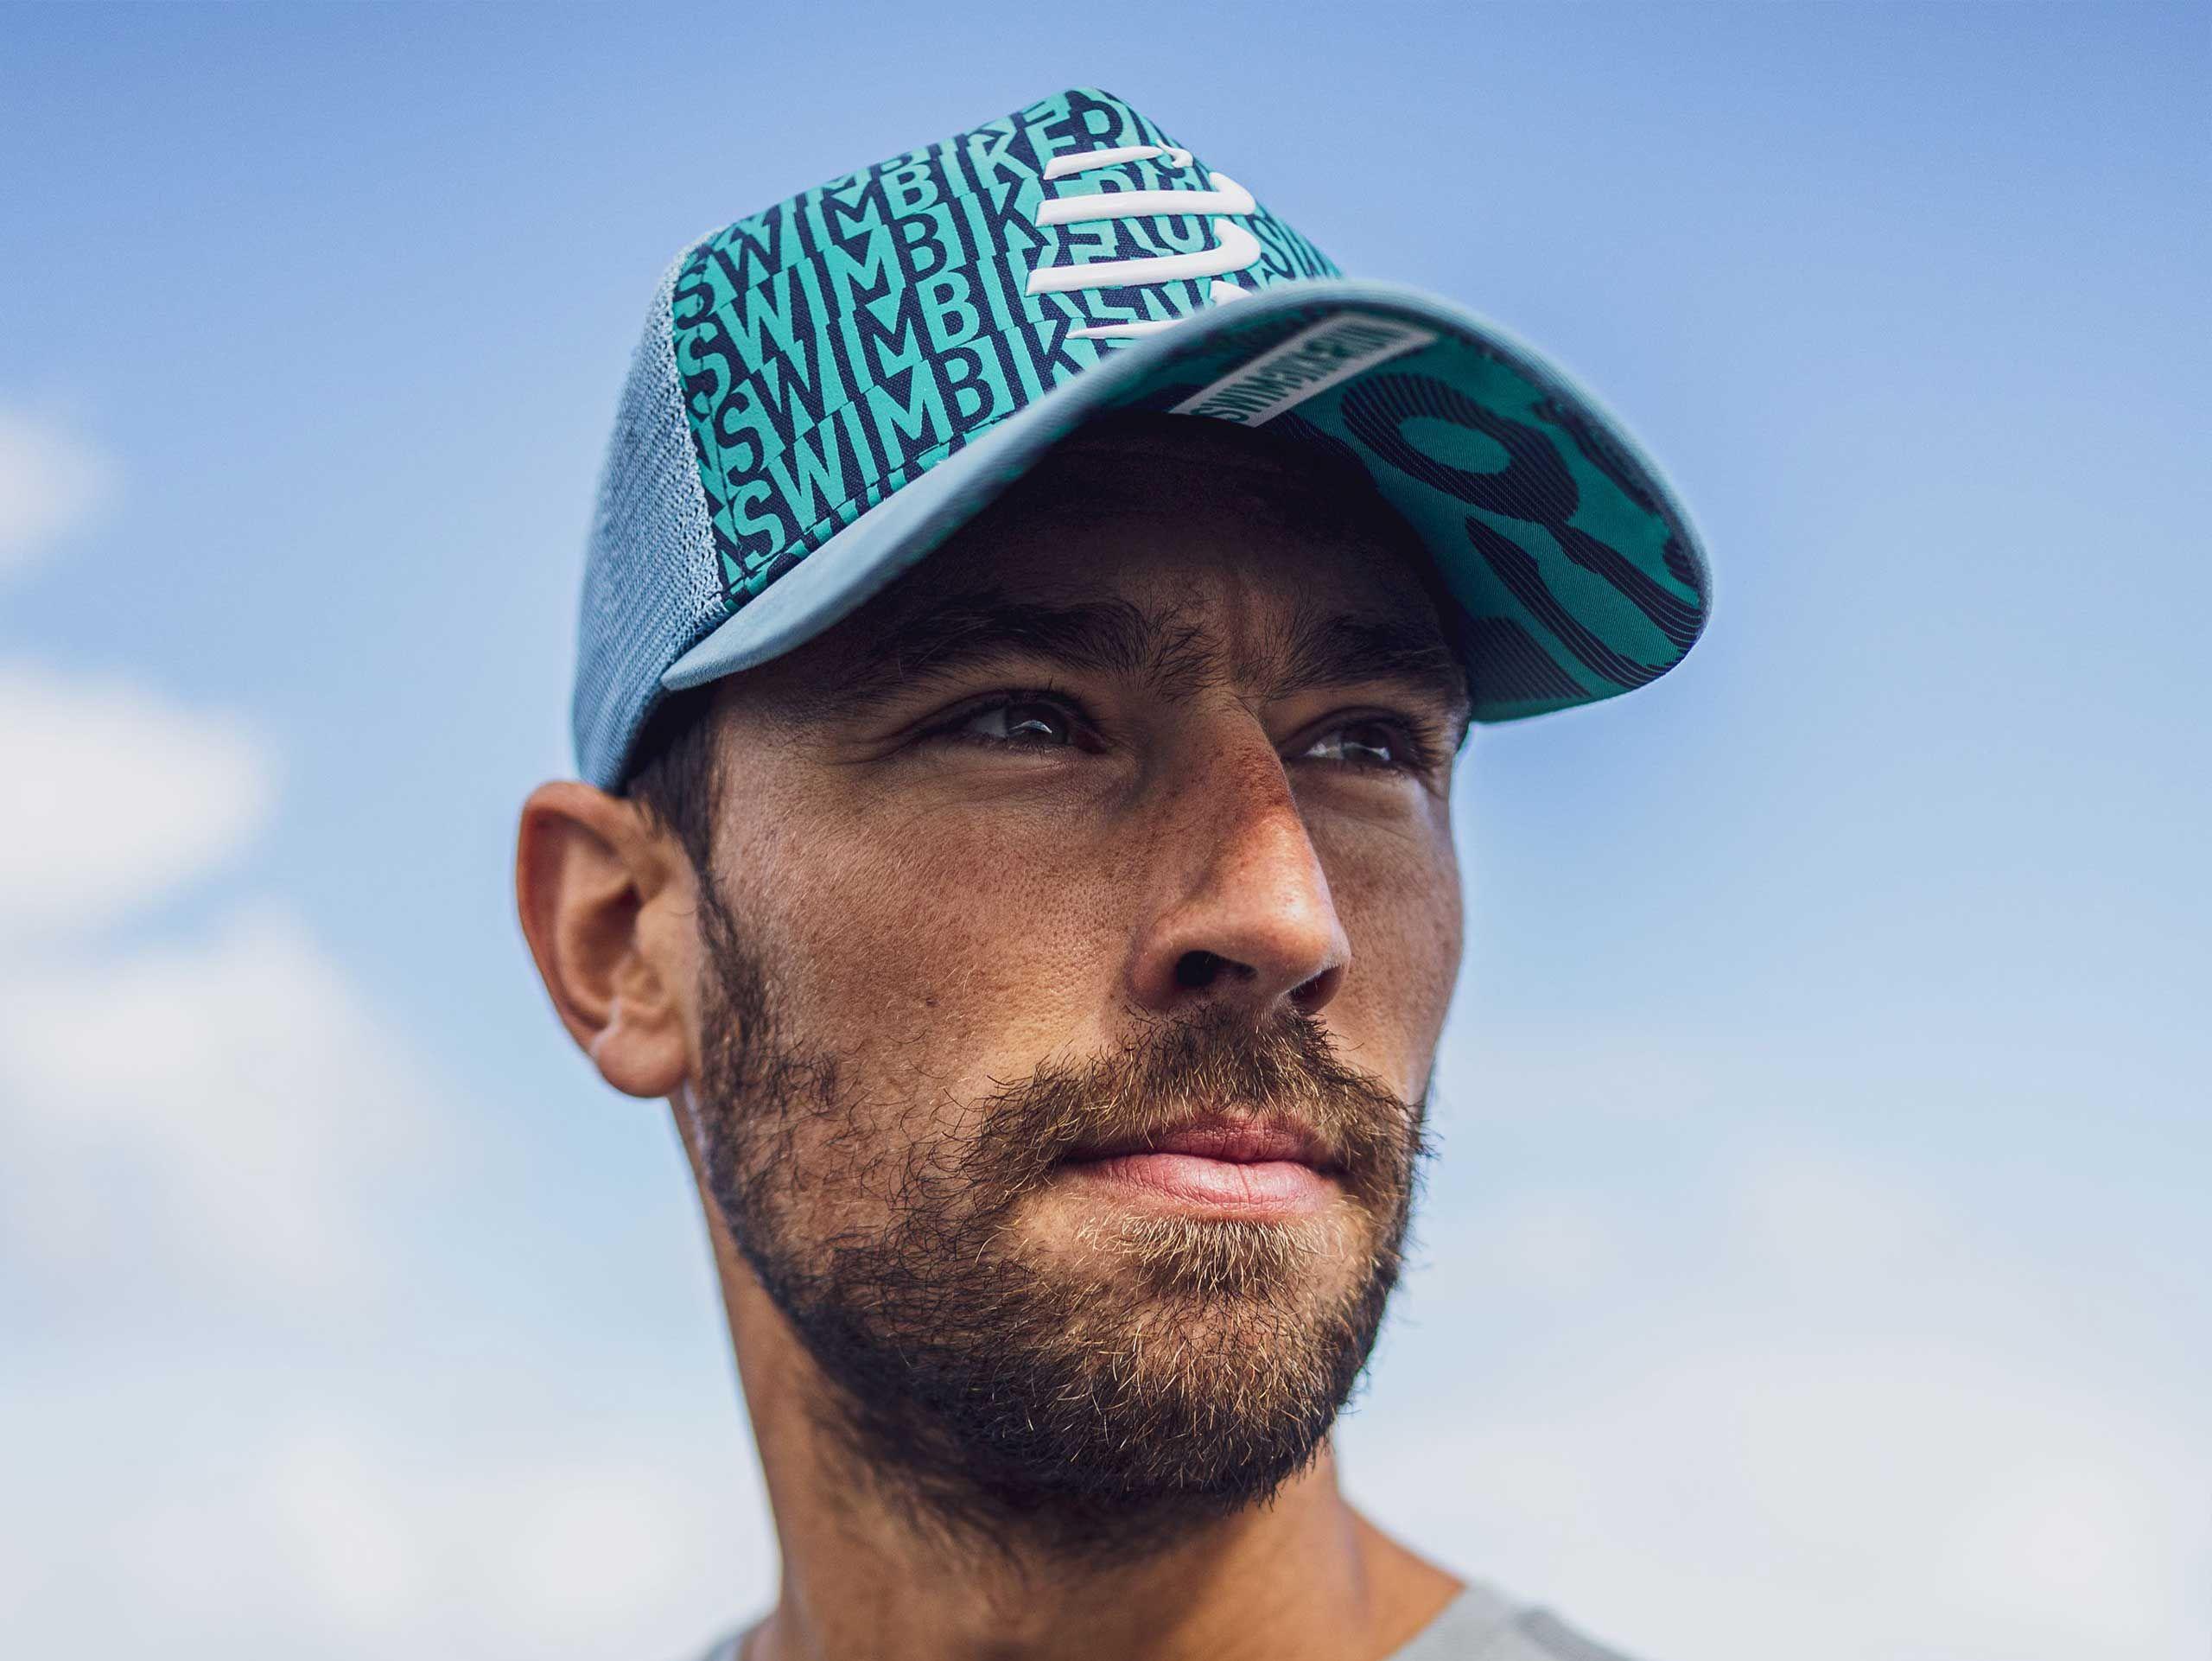 Trucker Cap - Born To SwimBikeRun 2021